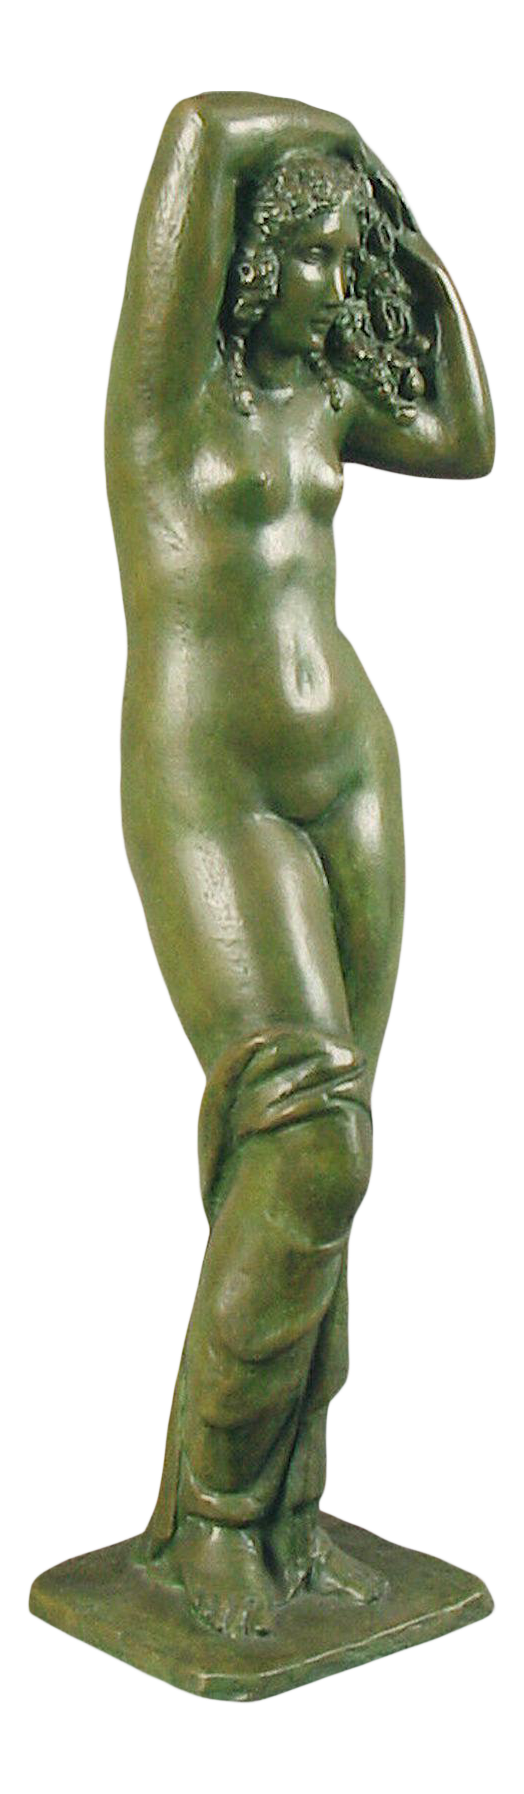 Antique Nude bronze lady sculpture